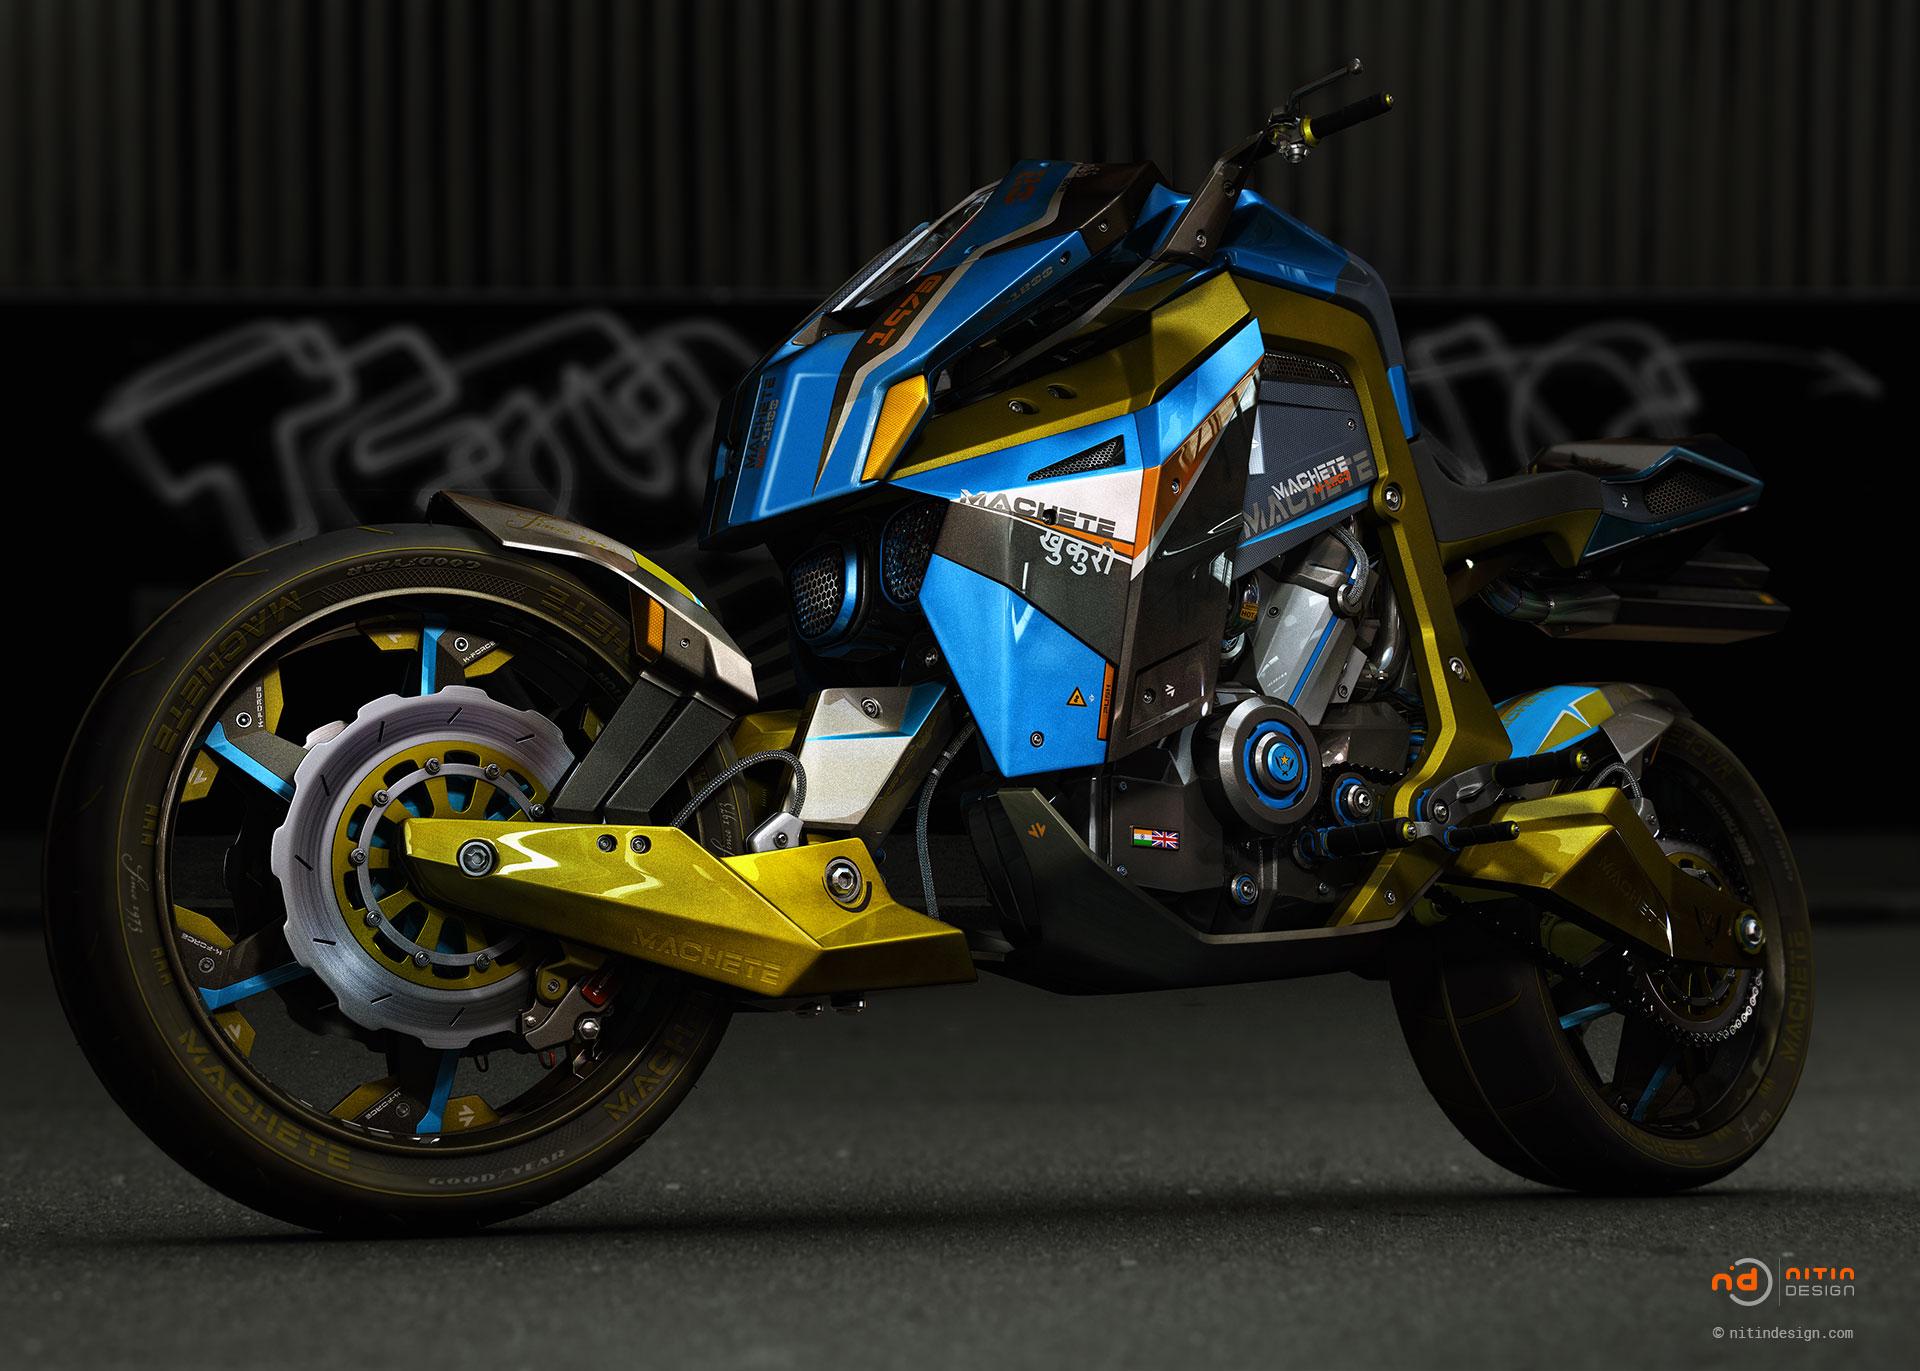 Machete-Motorbike-Nitin-Design